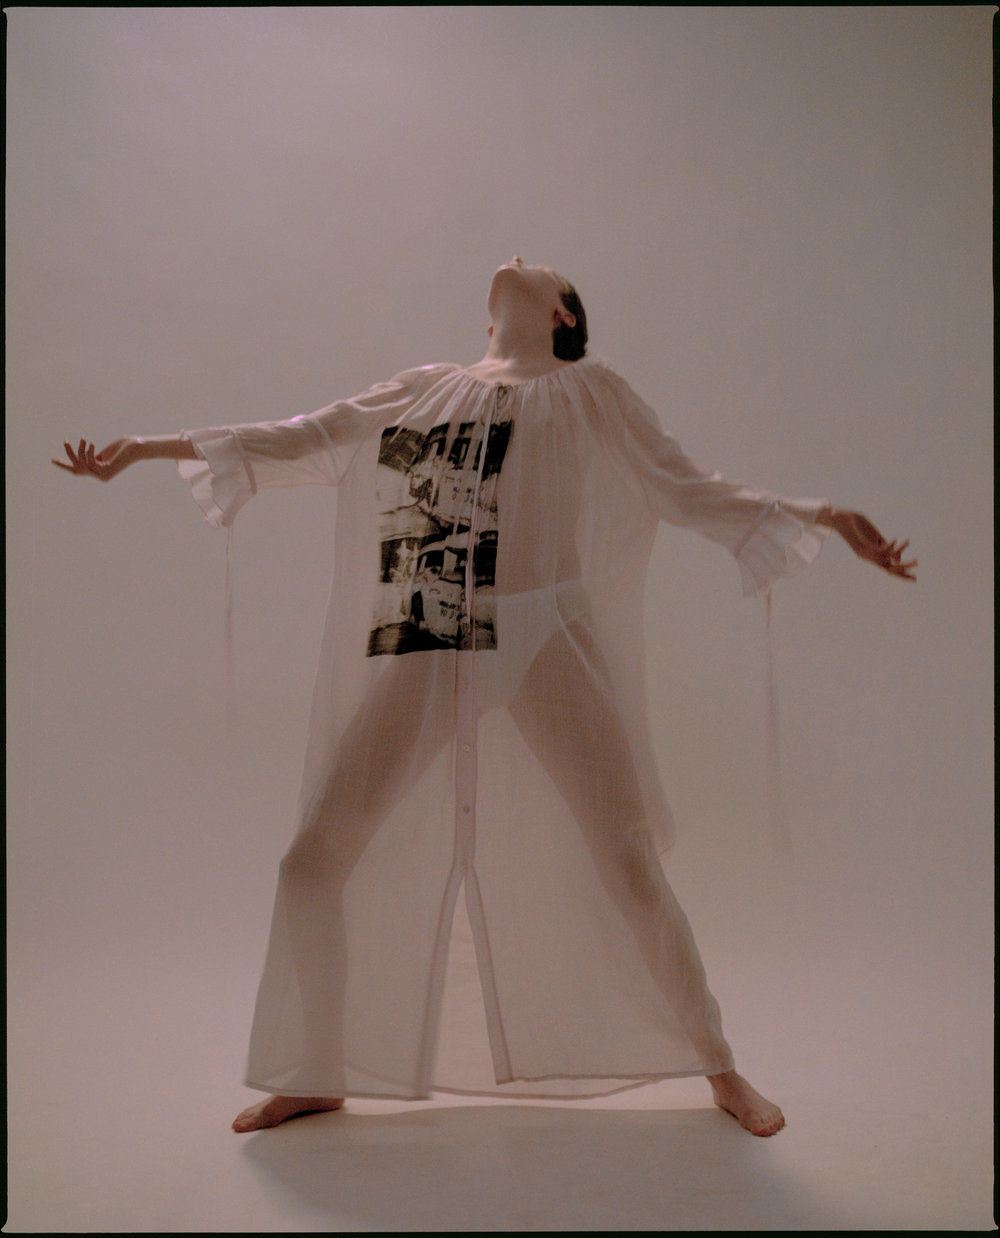 CALVIN KLEIN 205W39NYC dress.